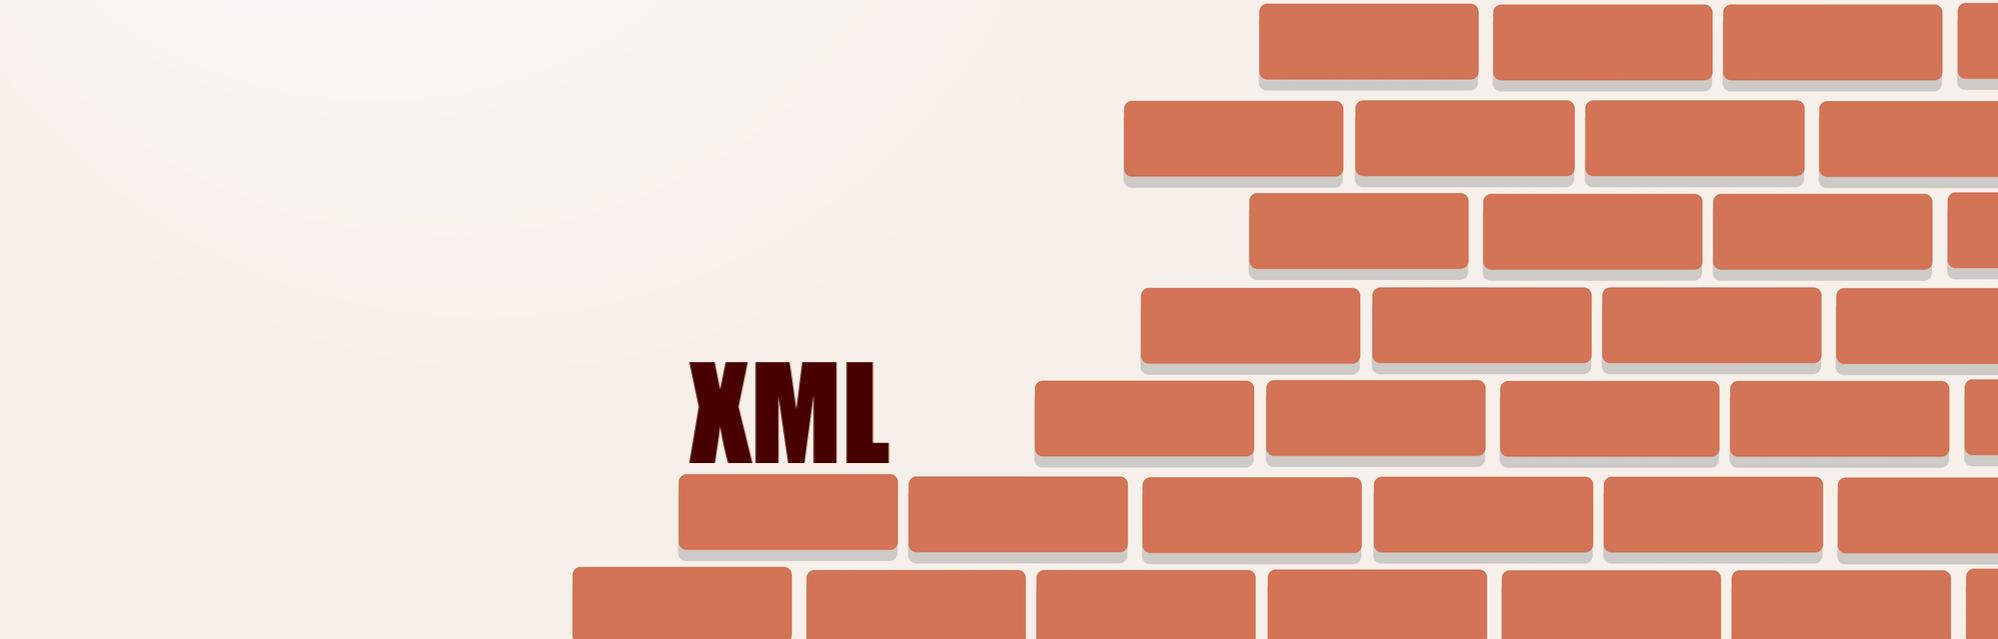 Xml Creation With Dom In Java Vichargrave Github Io